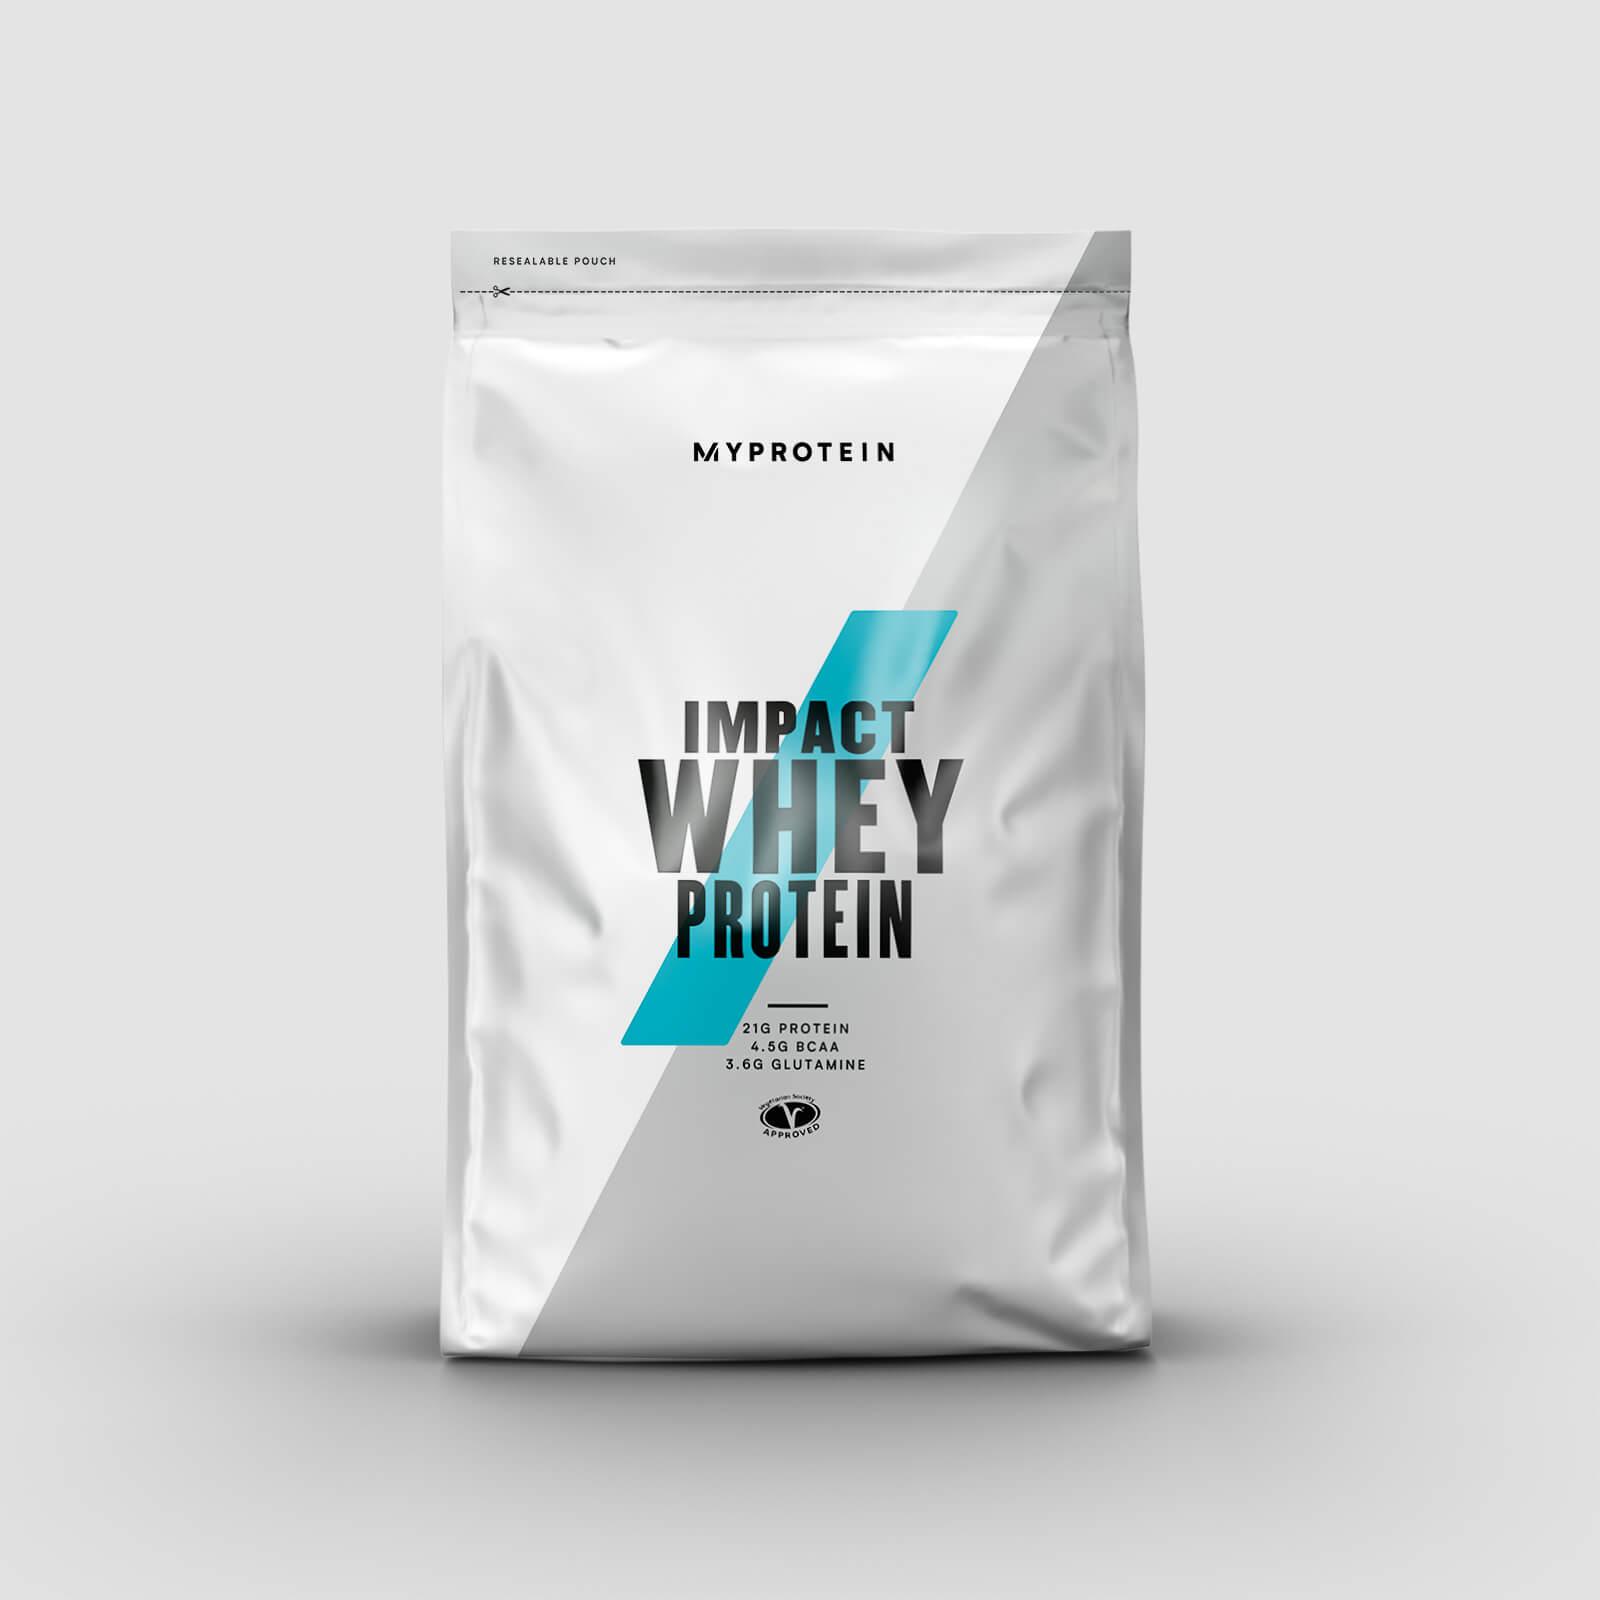 Myprotein Impact Whey Protein - 250g - Cookies ja Cream